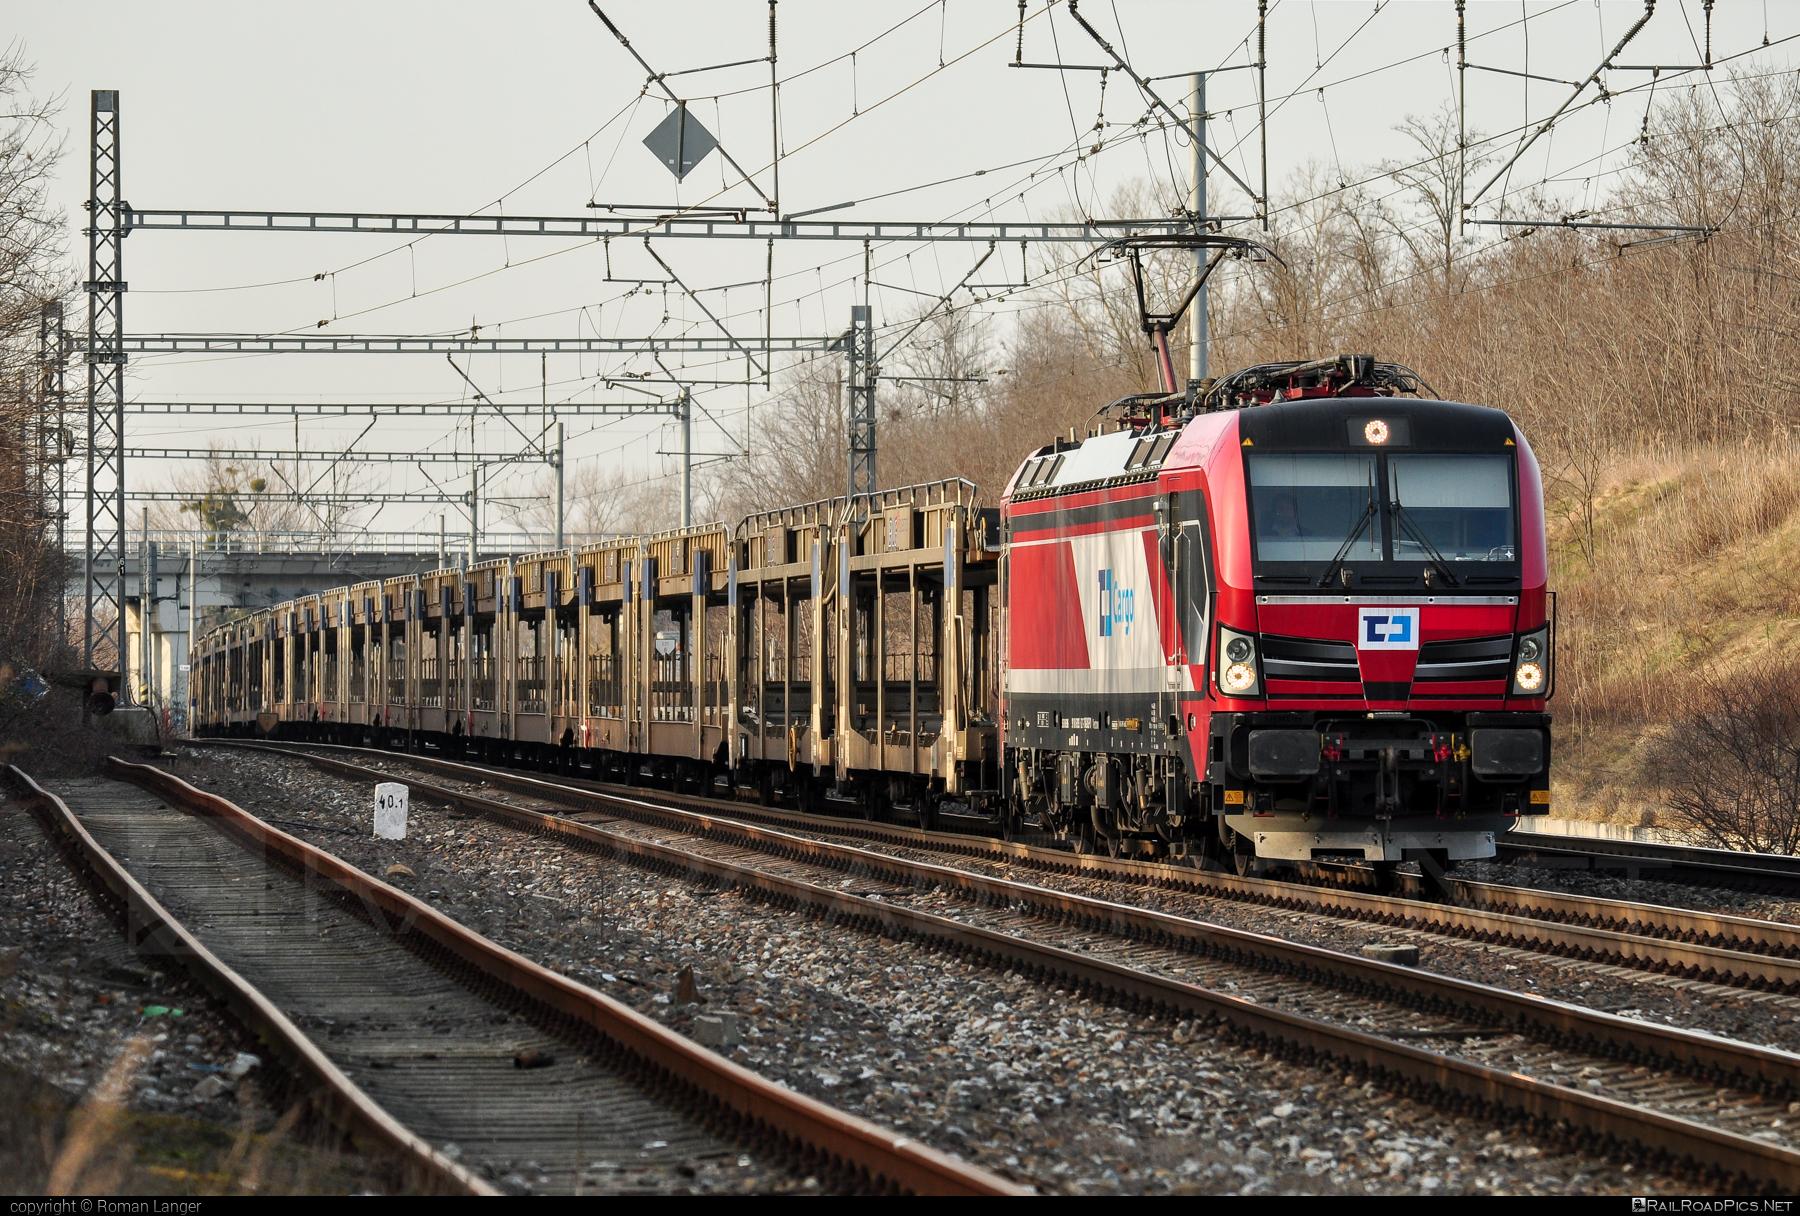 Siemens Vectron MS - 193 627-7 operated by ČD Cargo, a.s. #carcarrierwagon #cdcargo #dispolok #mitsuirailcapitaleurope #mitsuirailcapitaleuropegmbh #mrce #siemens #siemensvectron #siemensvectronms #vectron #vectronms